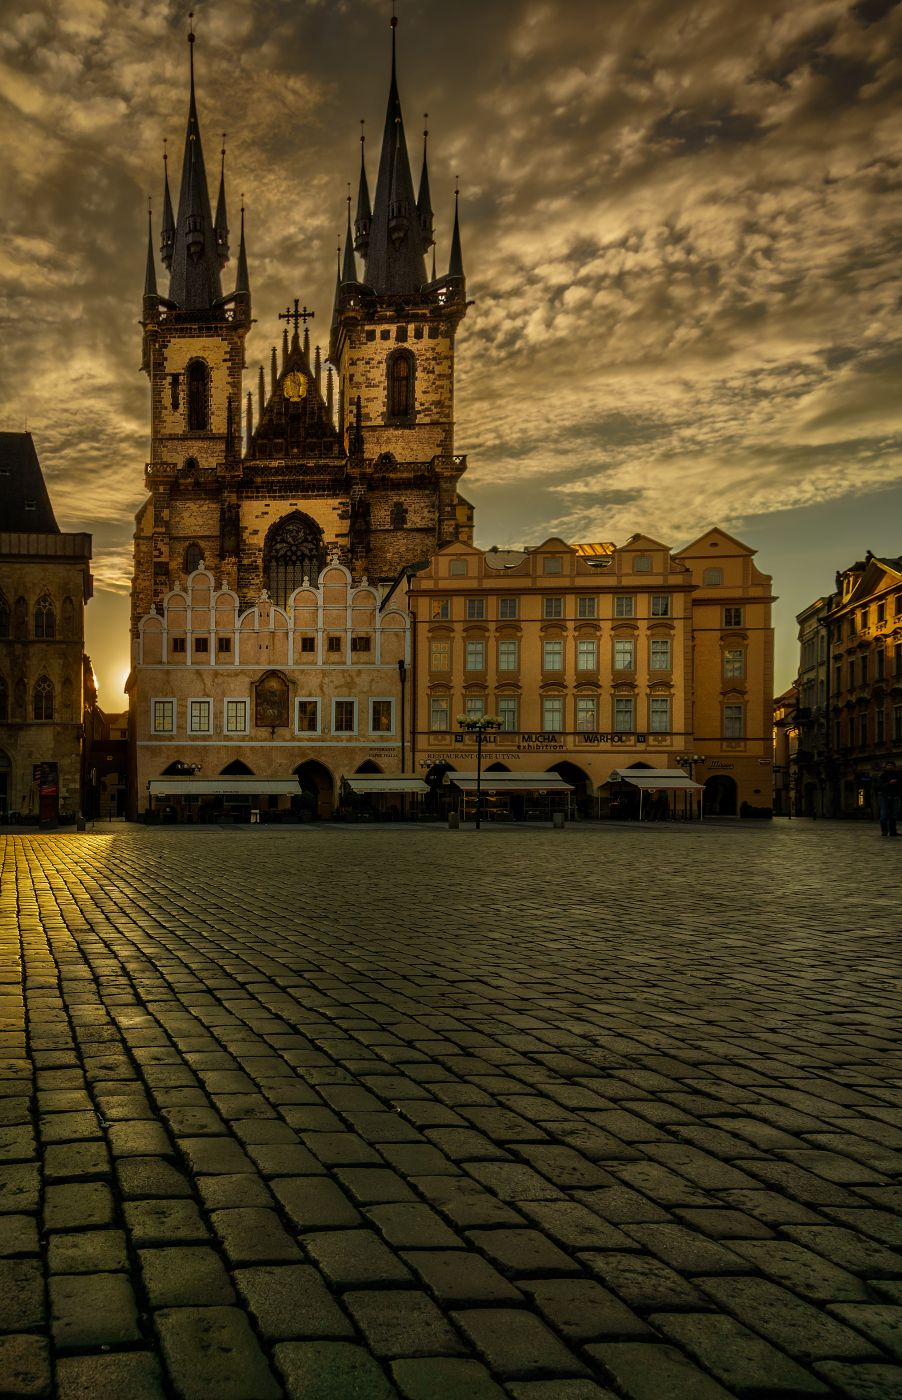 Church of our lady, Czech Republic